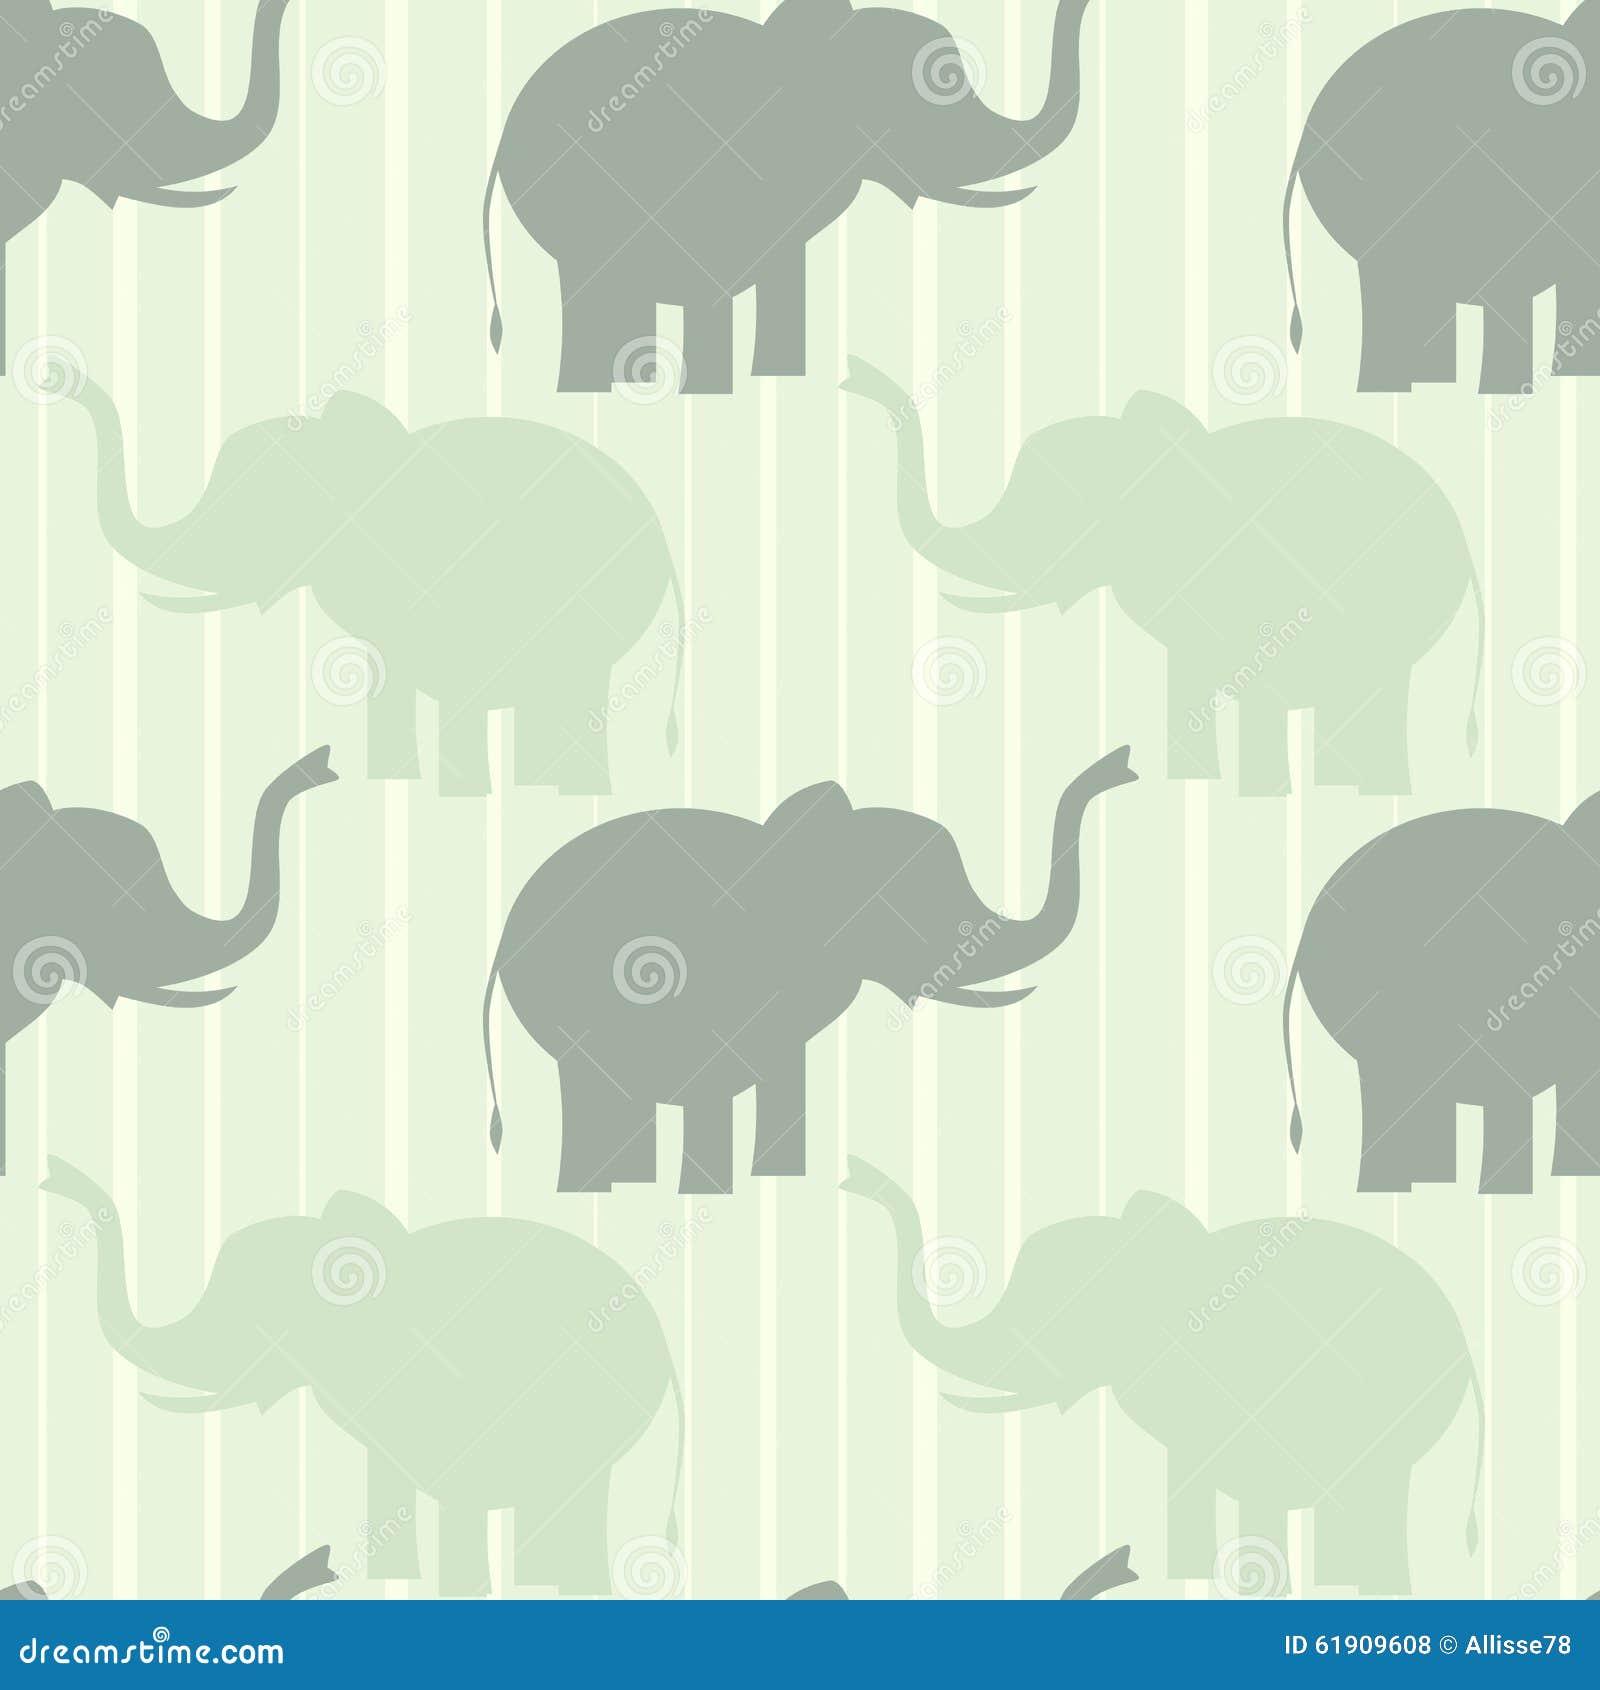 Elephants background pattern